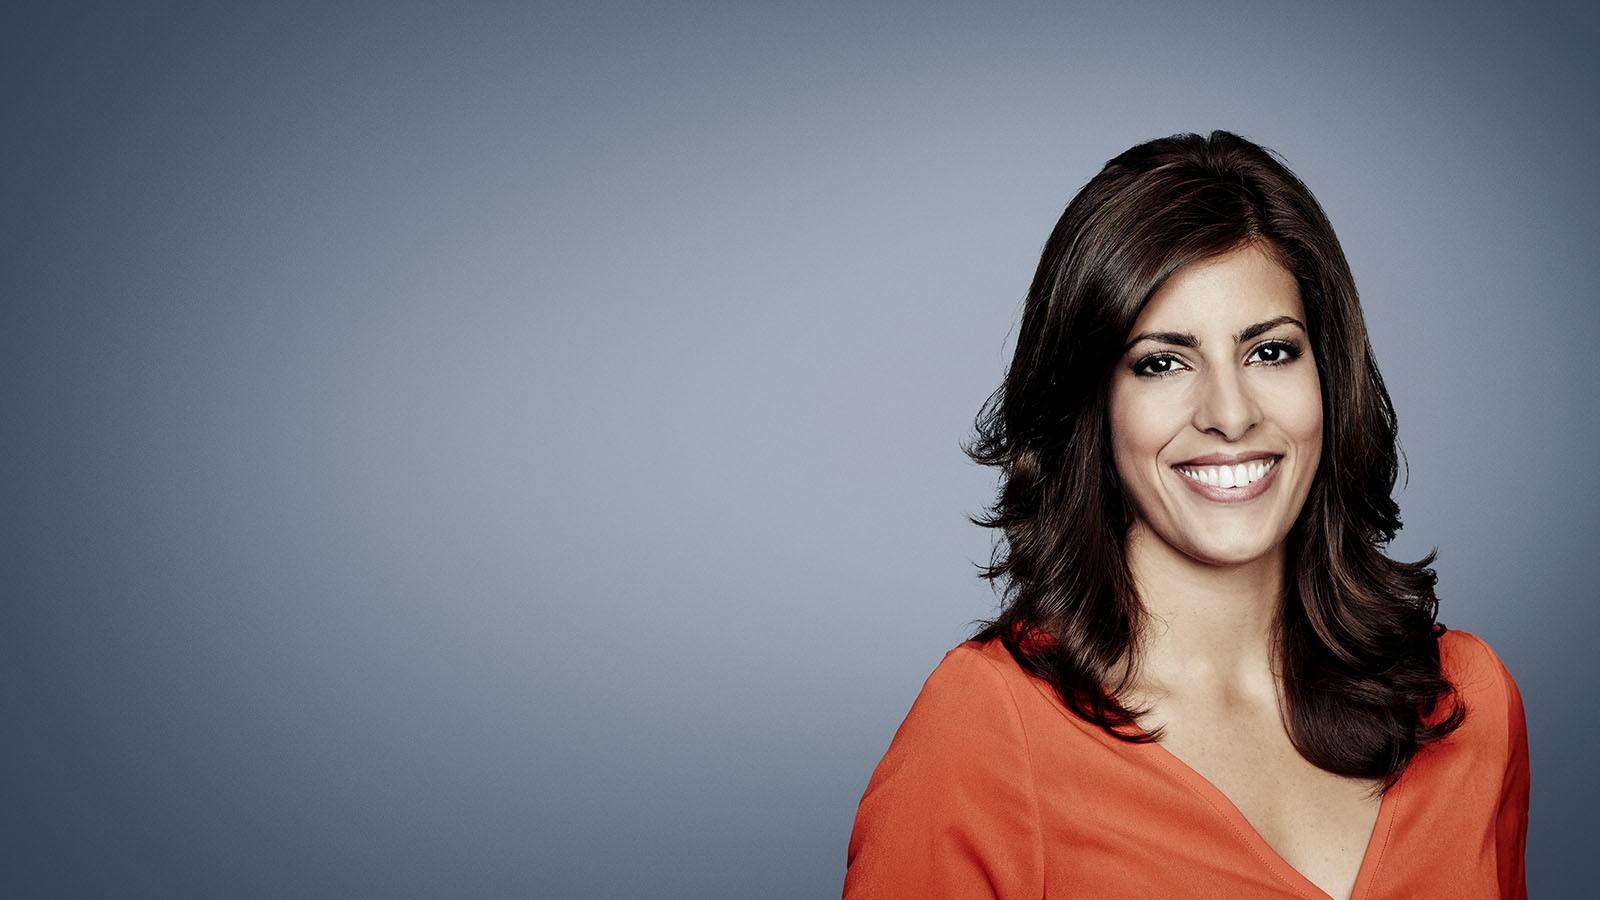 Cnn Profiles Christina Macfarlane Anchor And